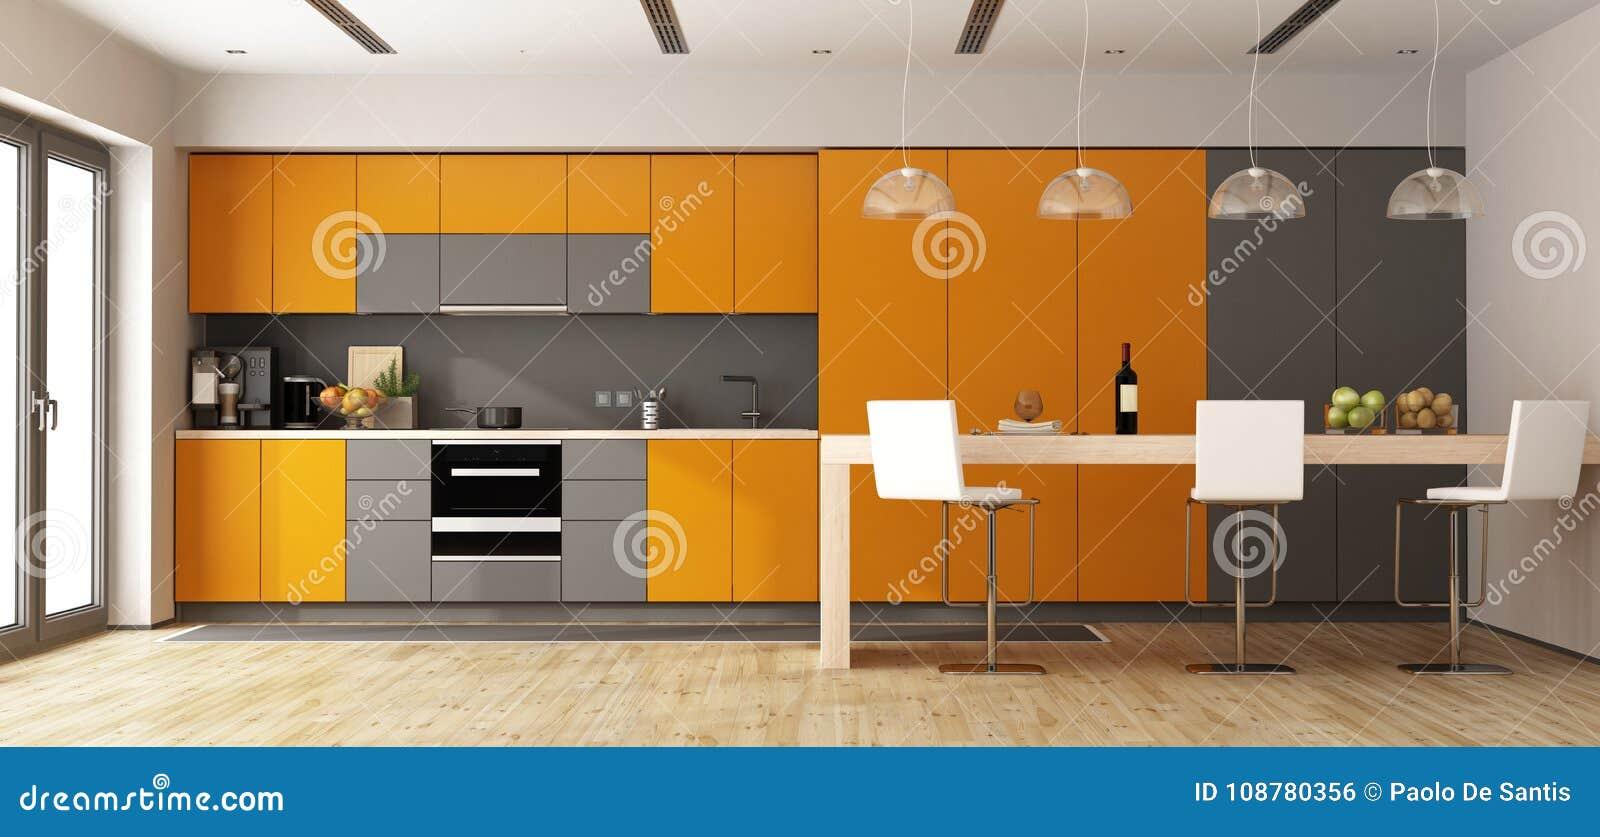 cuisine moderne orange et grise